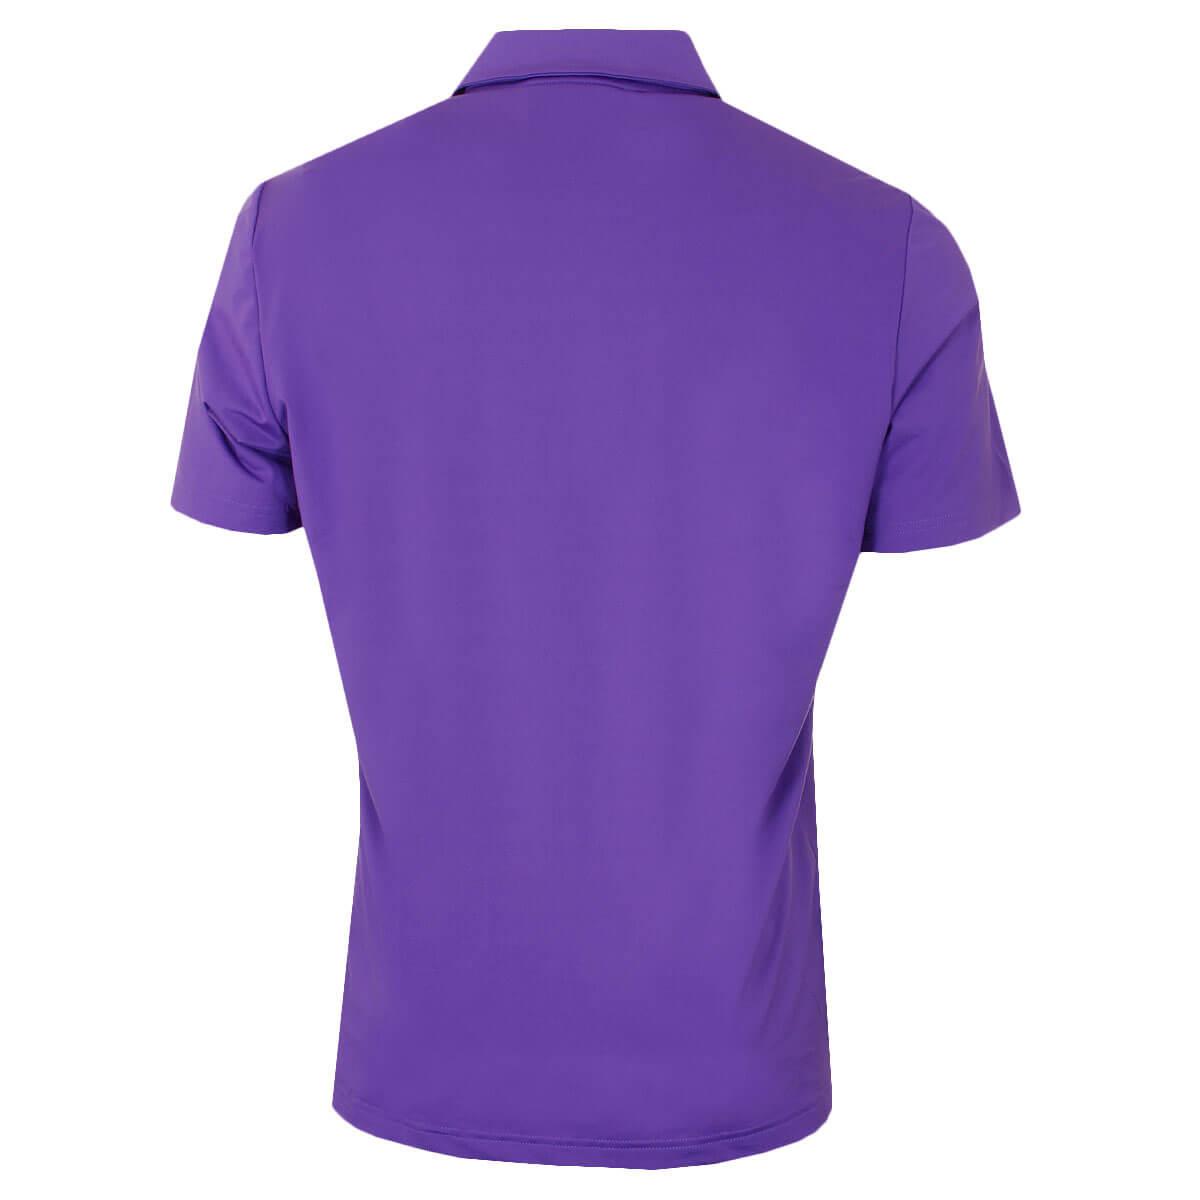 Adidas-Golf-Men-039-s-Ultimate-2-0-Solid-Crestable-Polo-Shirt thumbnail 25